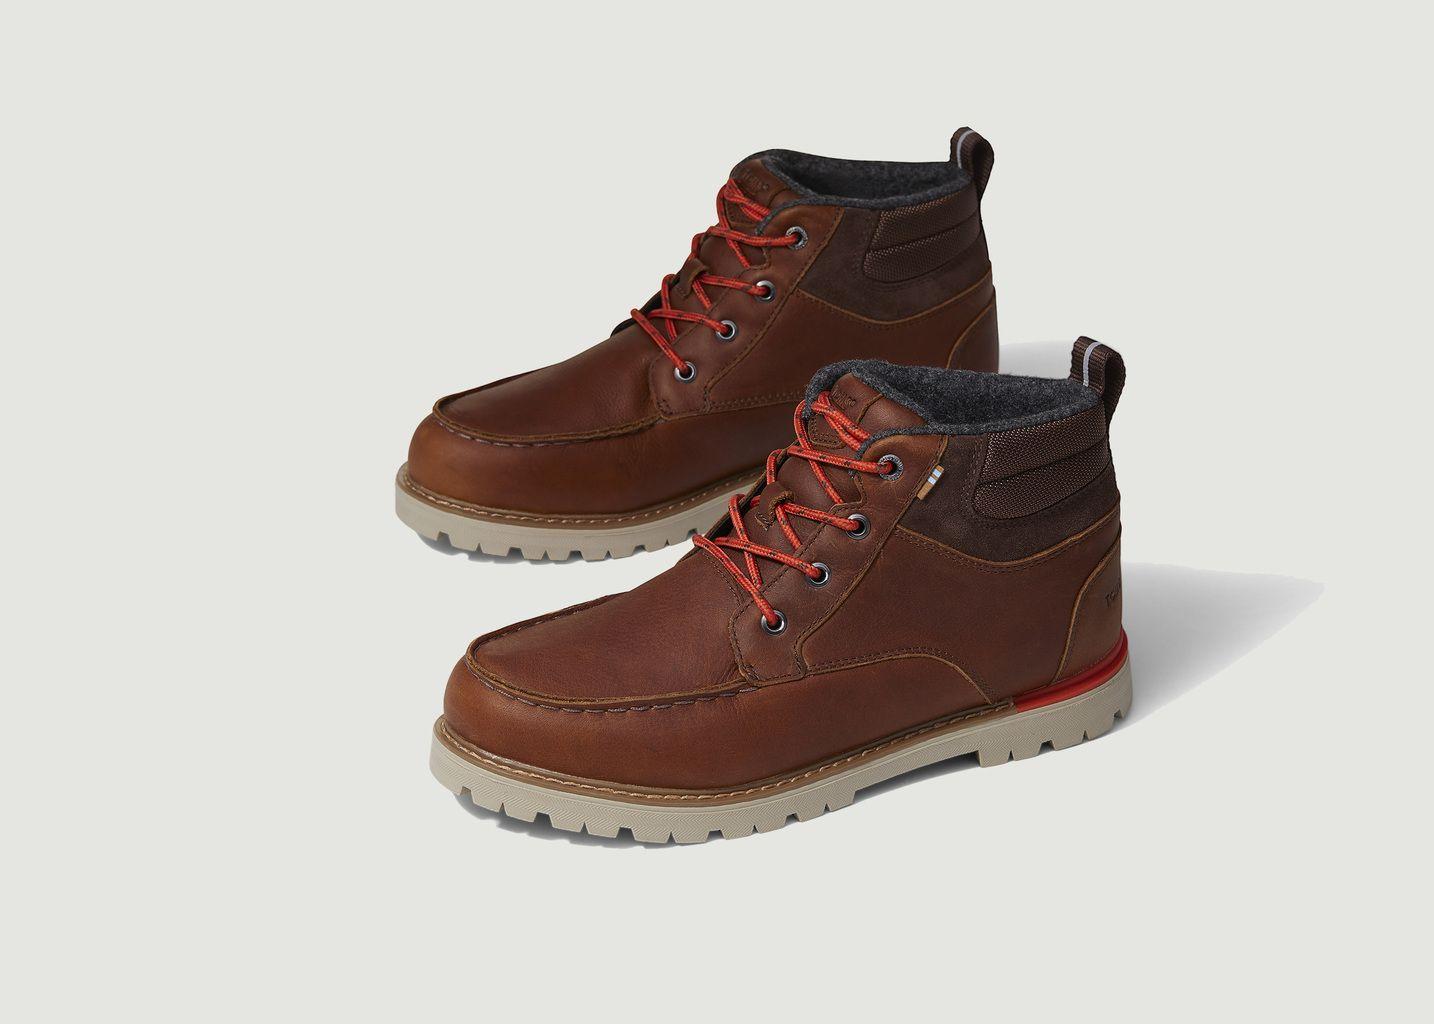 Boots en cuir Hawthorne 2.0 - Toms